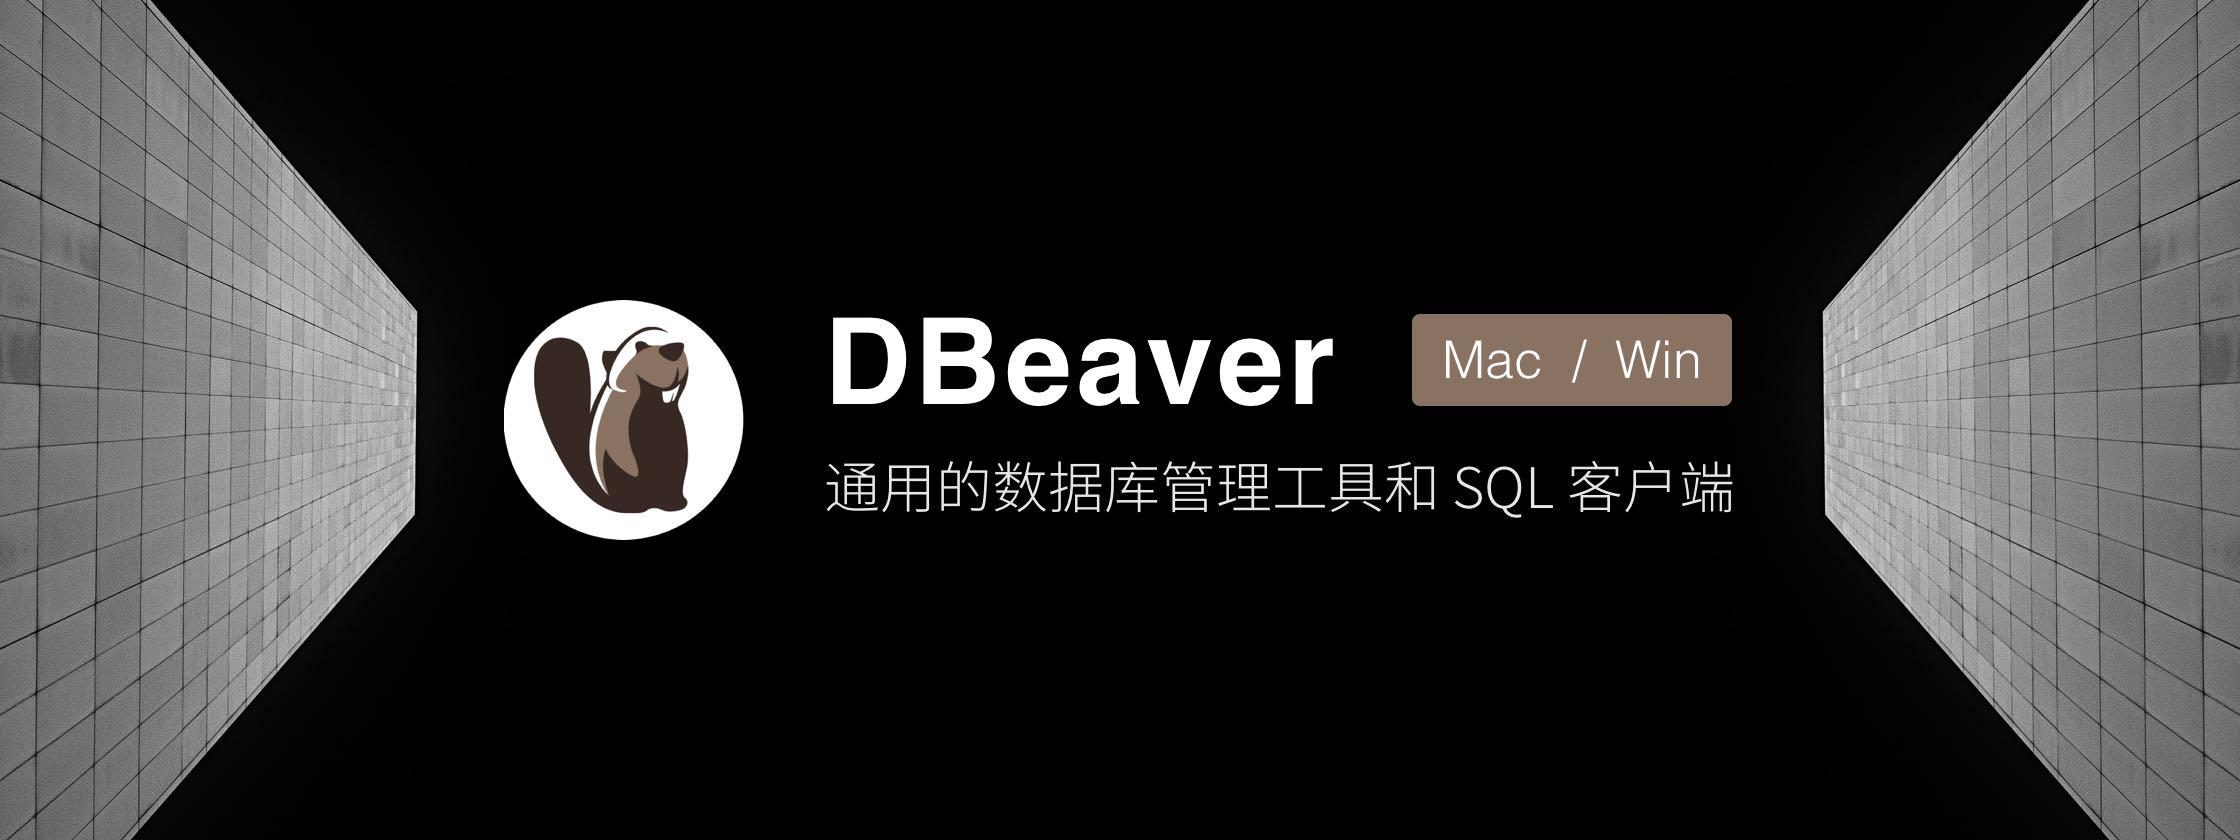 DBeaver:通用的数据库管理工具和 SQL 客户端